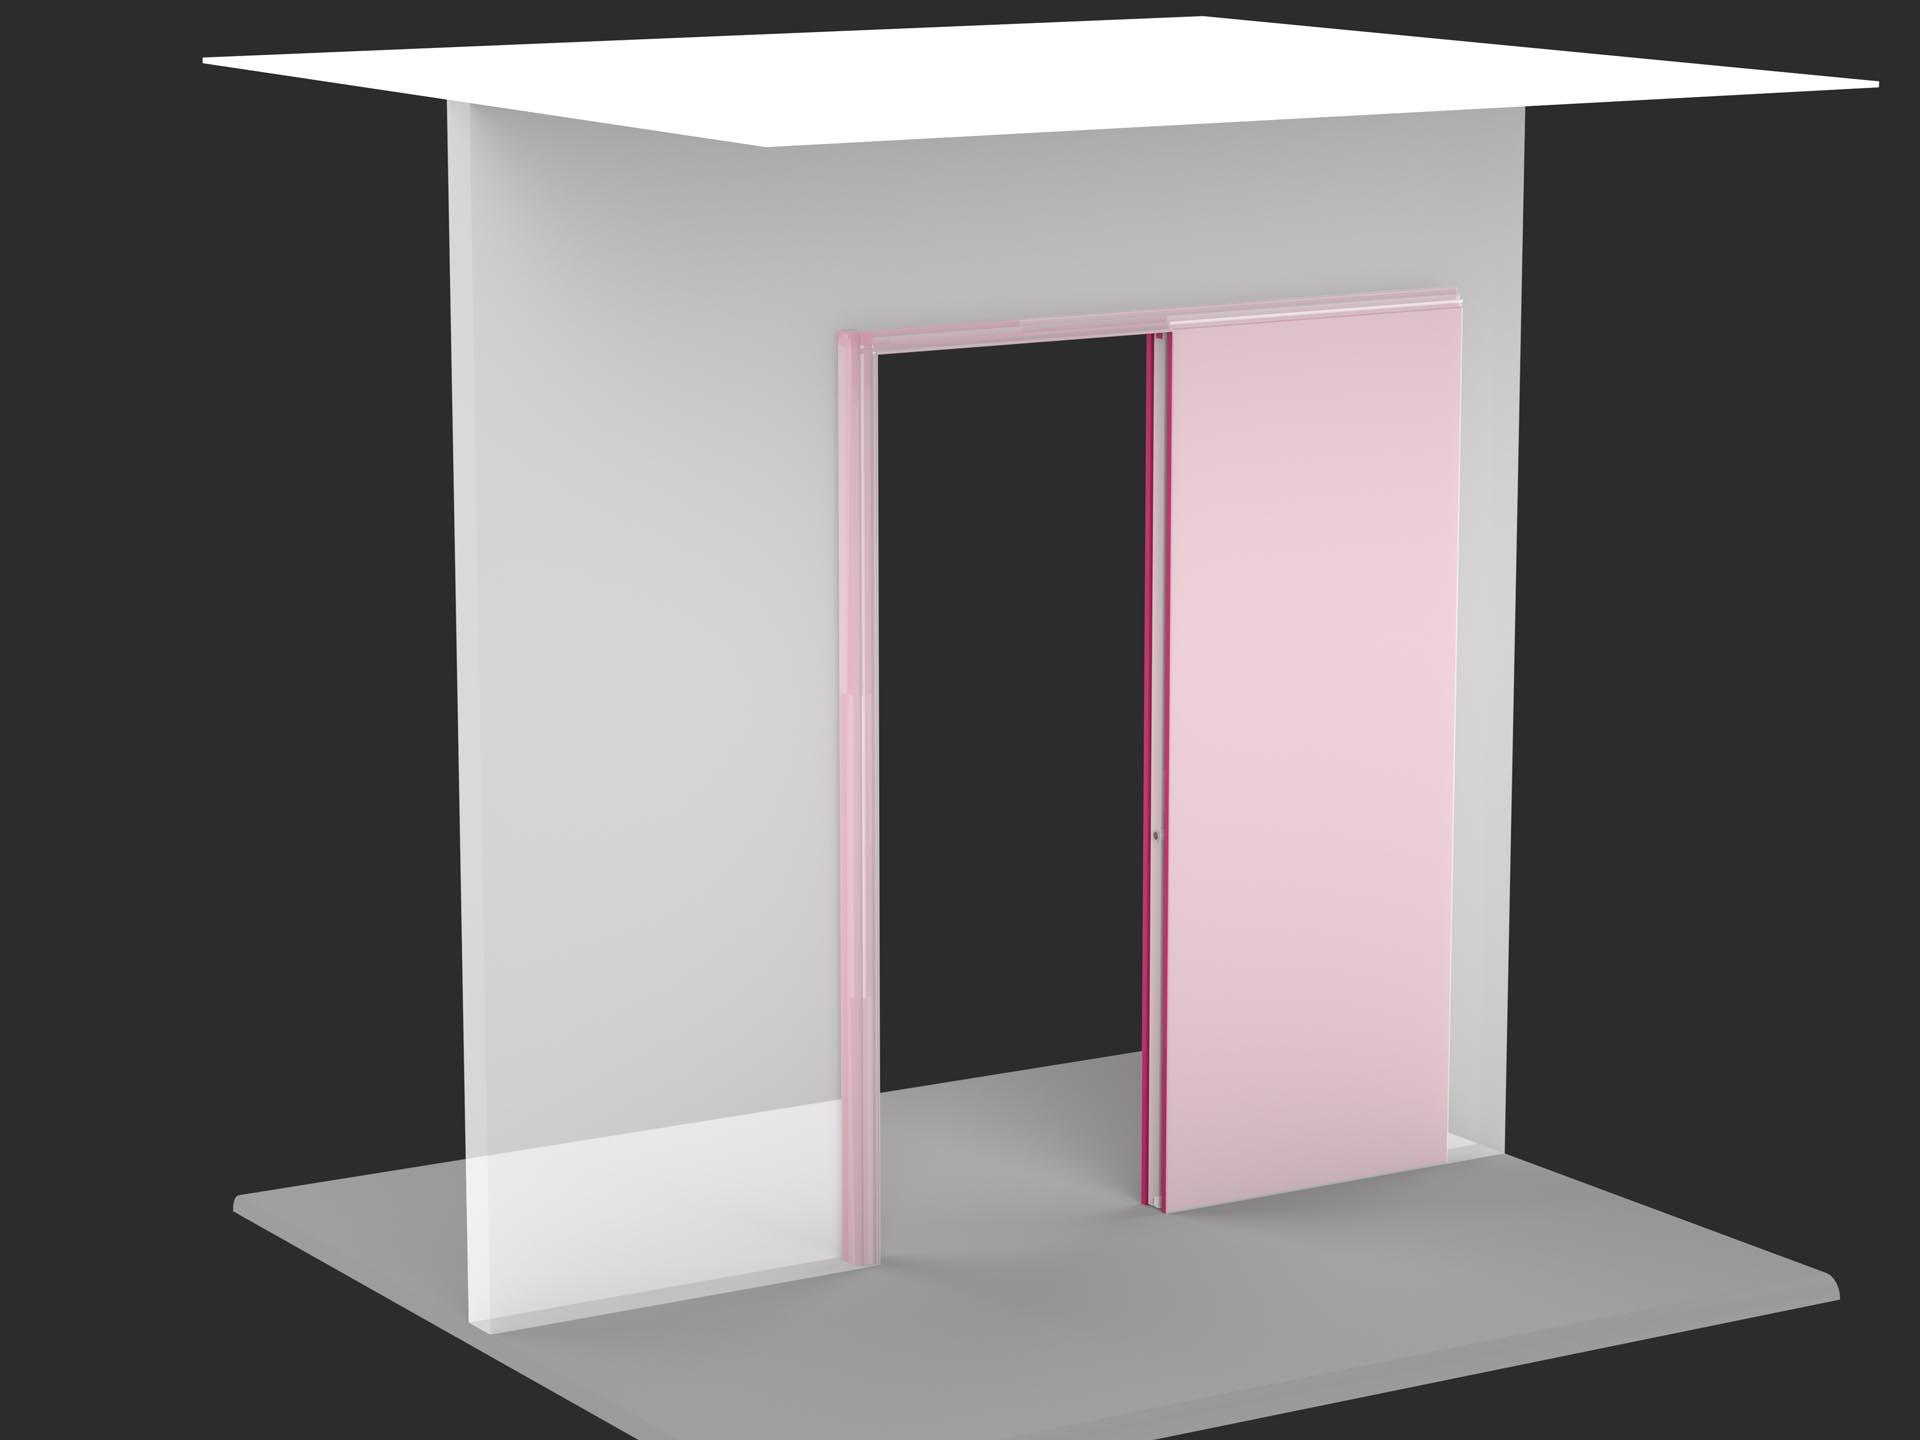 Porta scorrevole interno muro  Evoline3